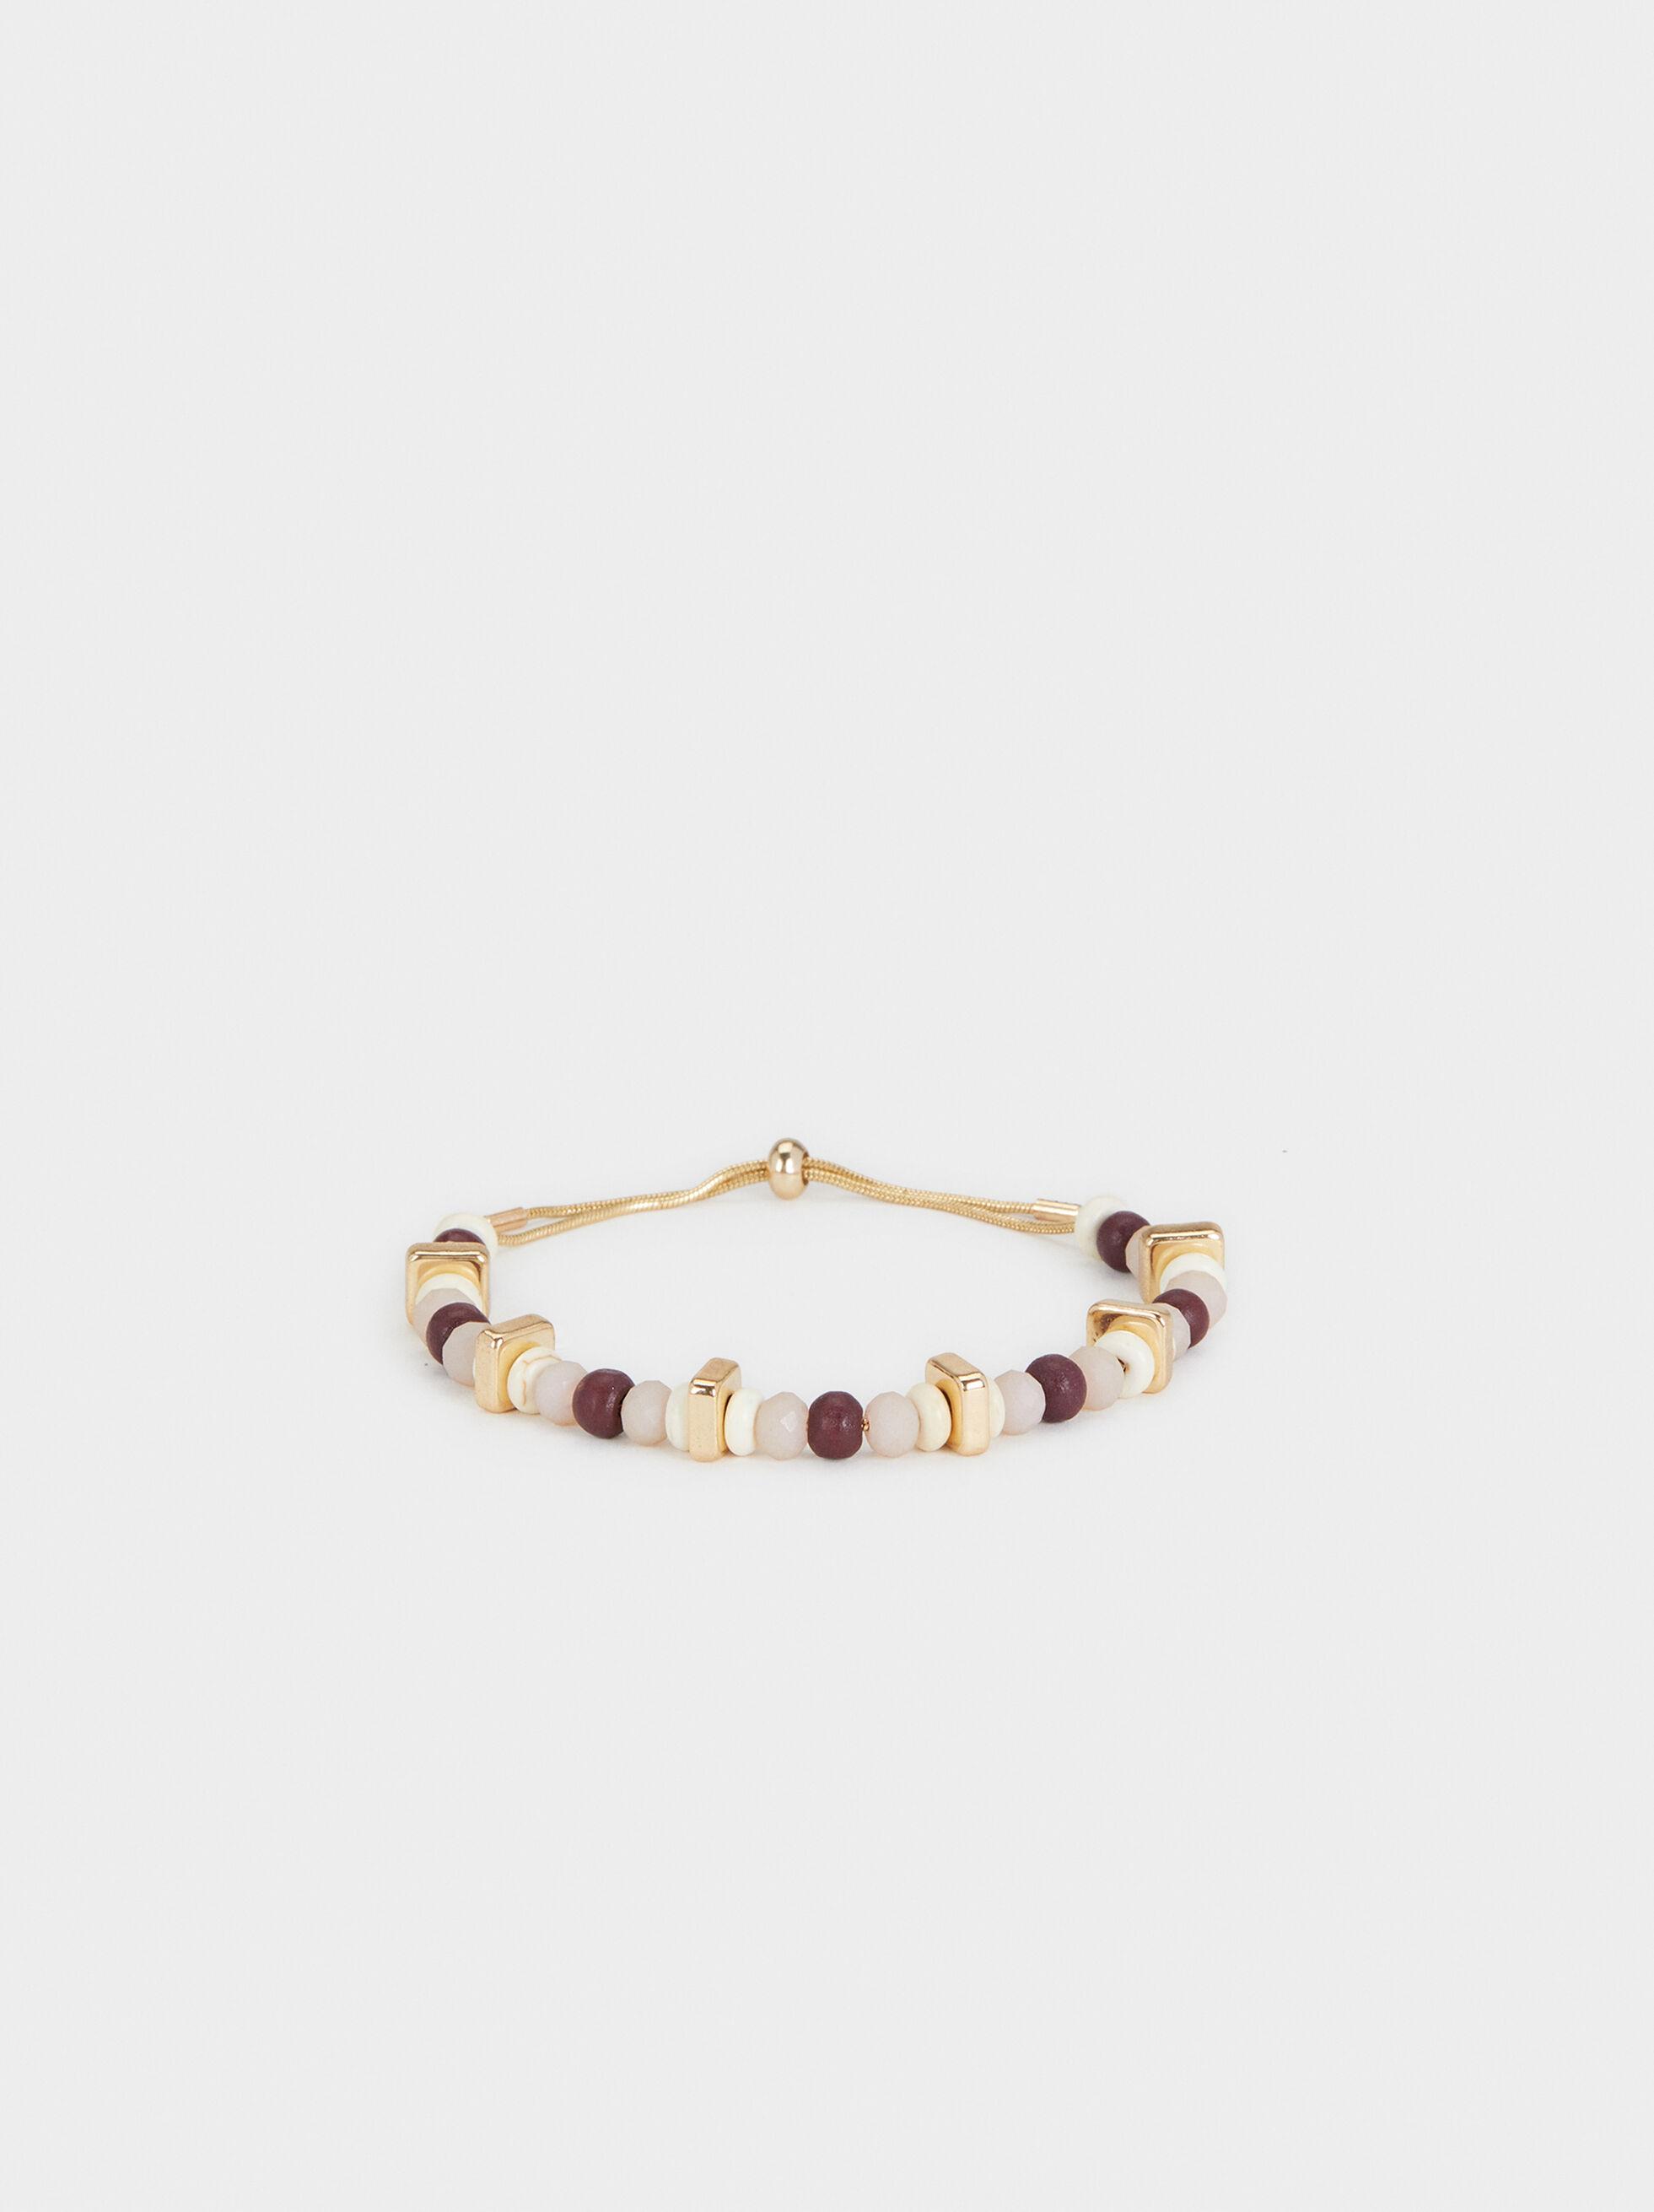 Land Adjustable Bracelet With Stones, Multicolor, hi-res